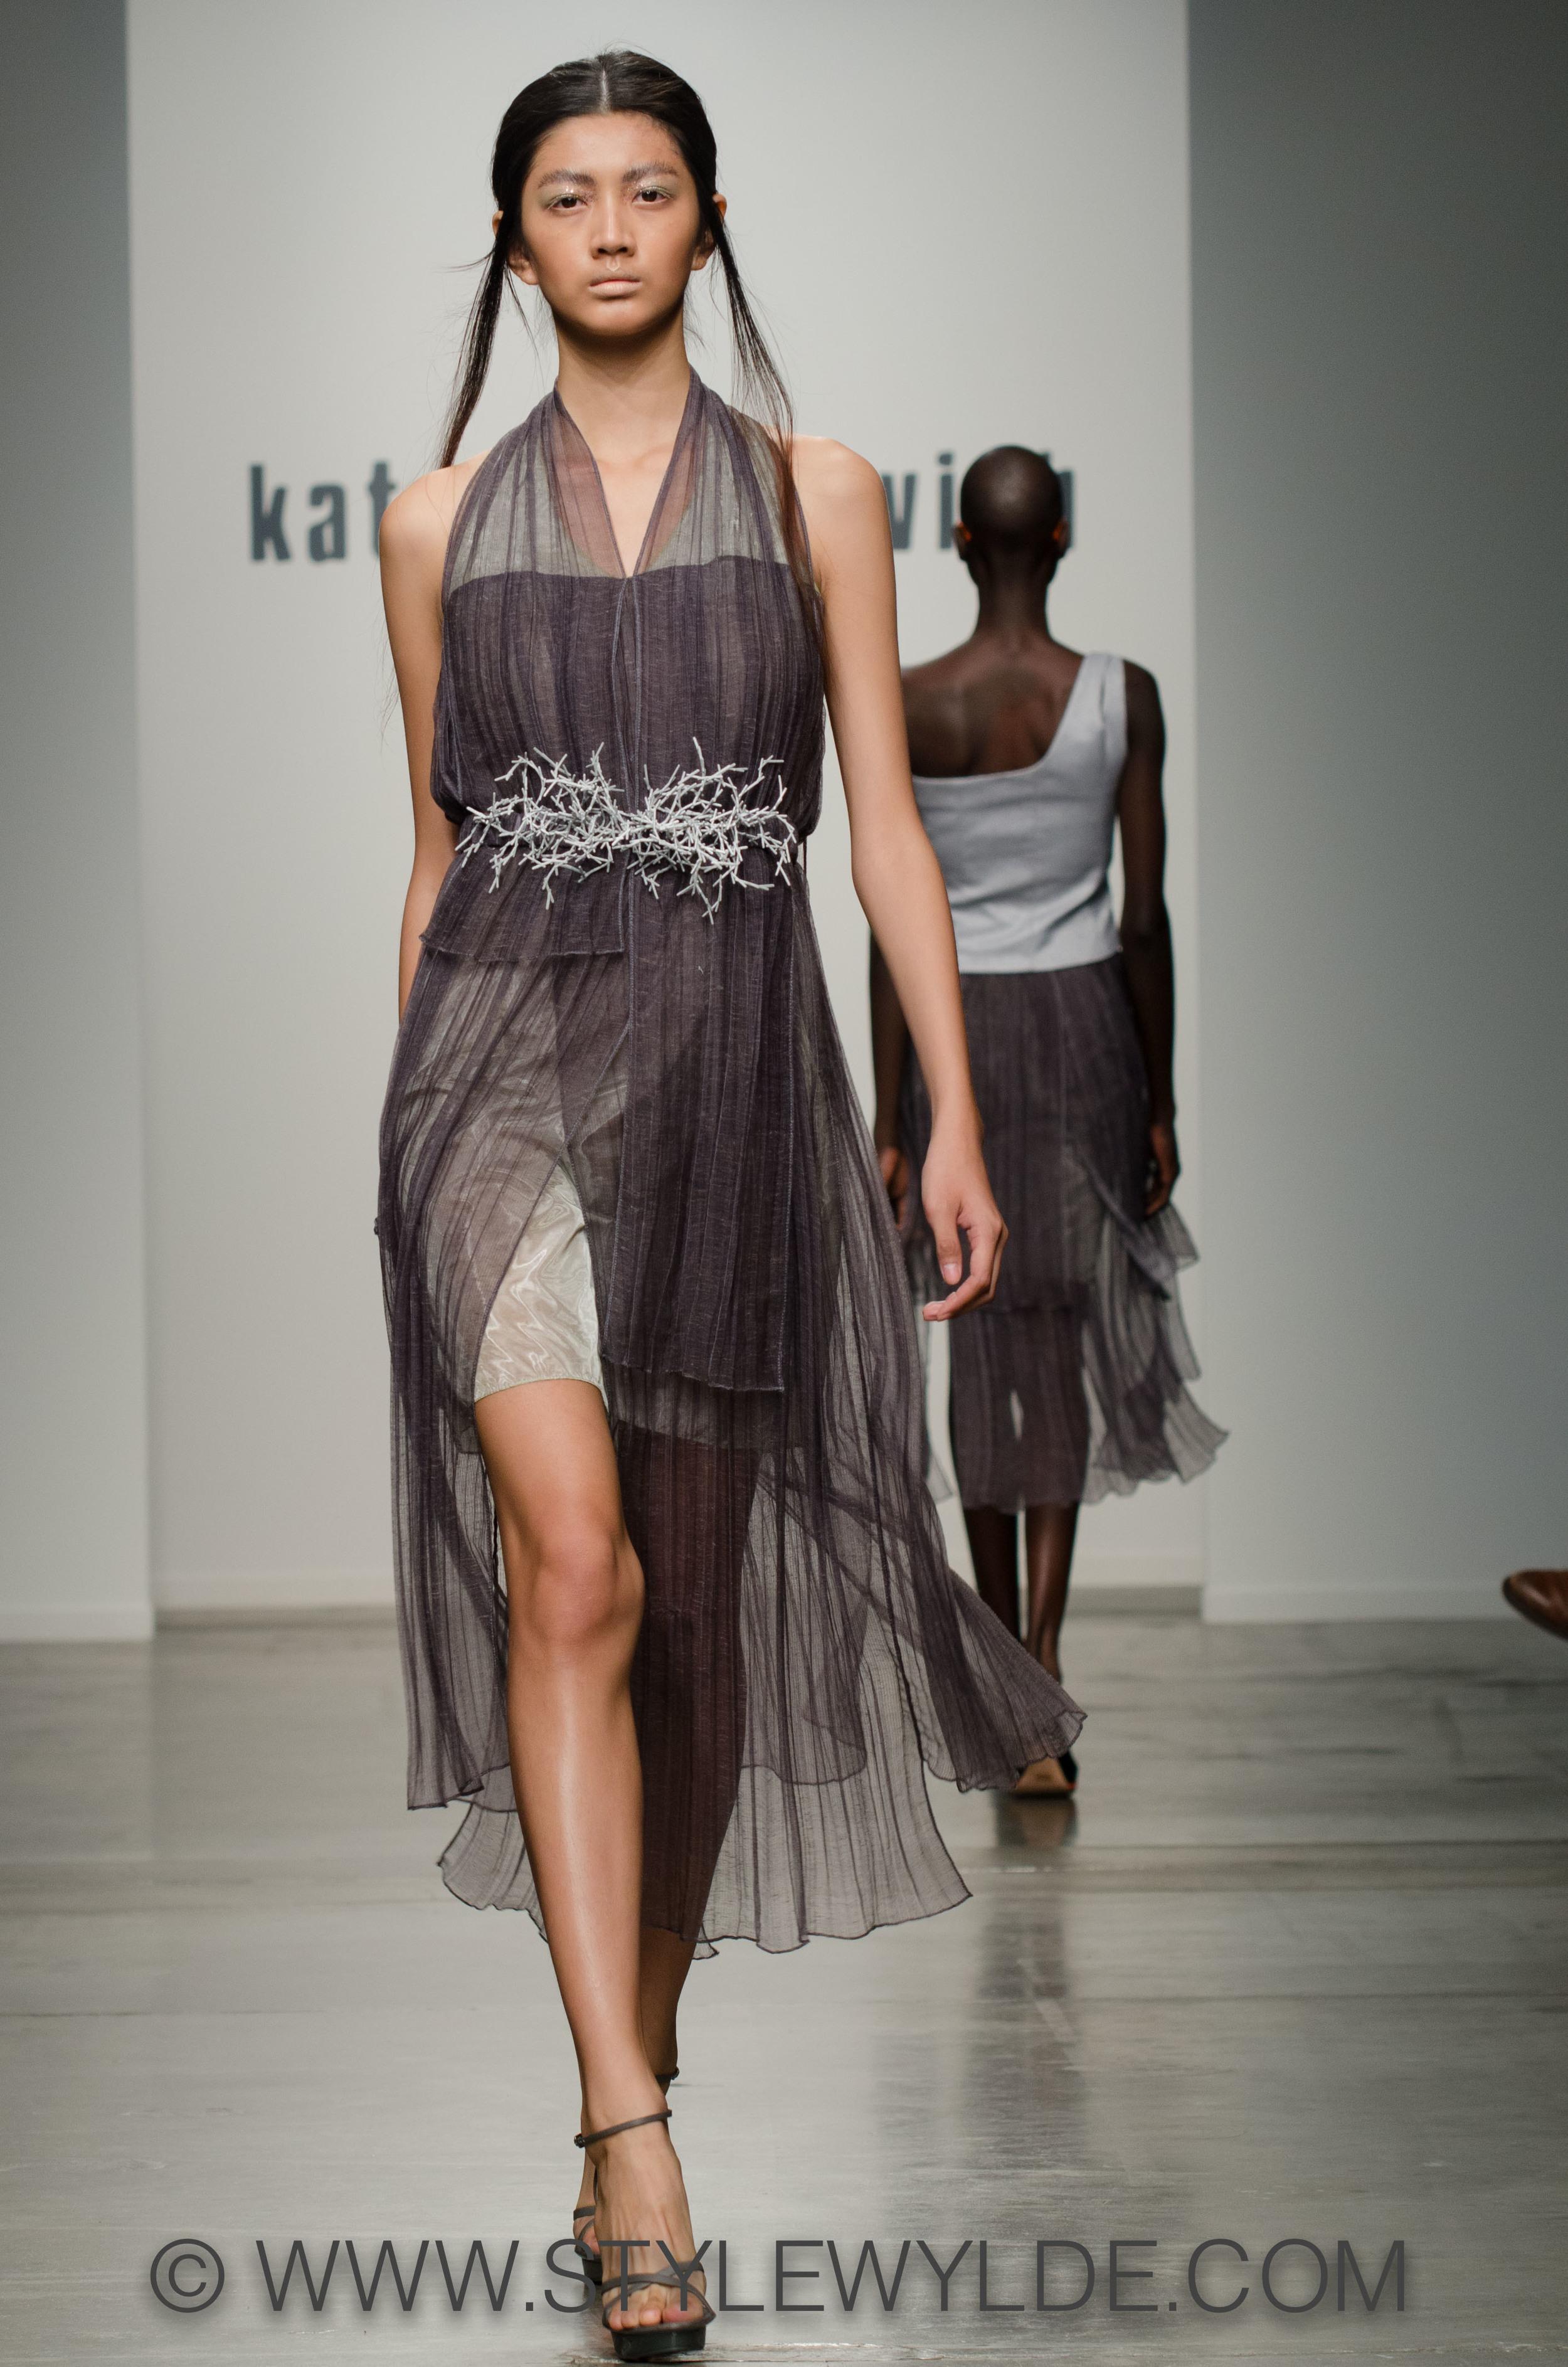 StyleWylde_KatyaSS15_FOH (7 of 28).jpg